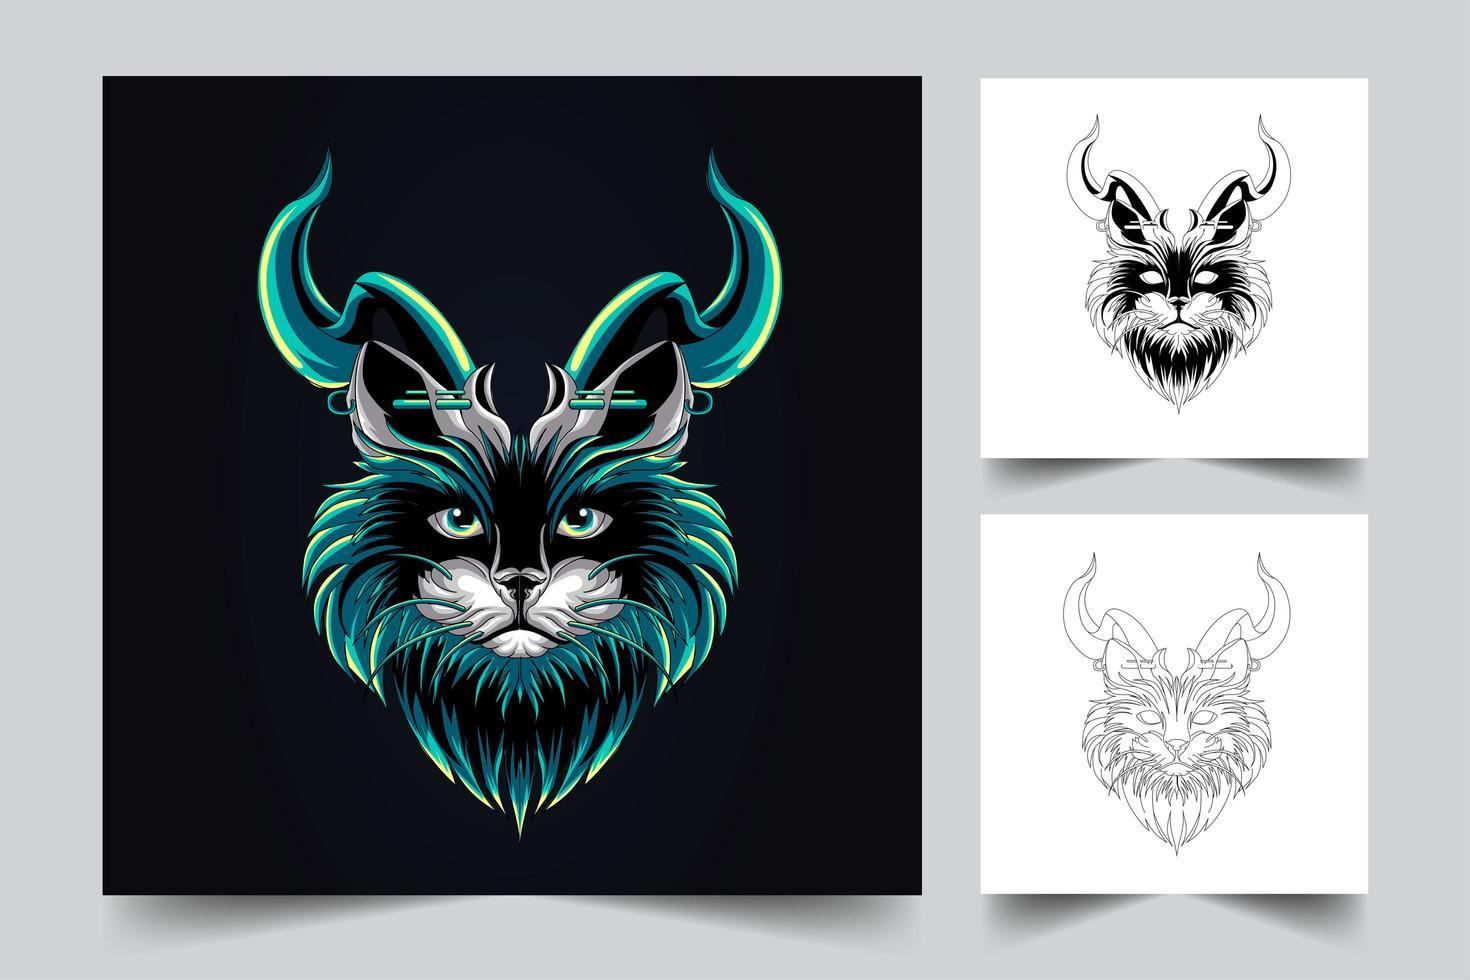 cute cat artwork illustration vector